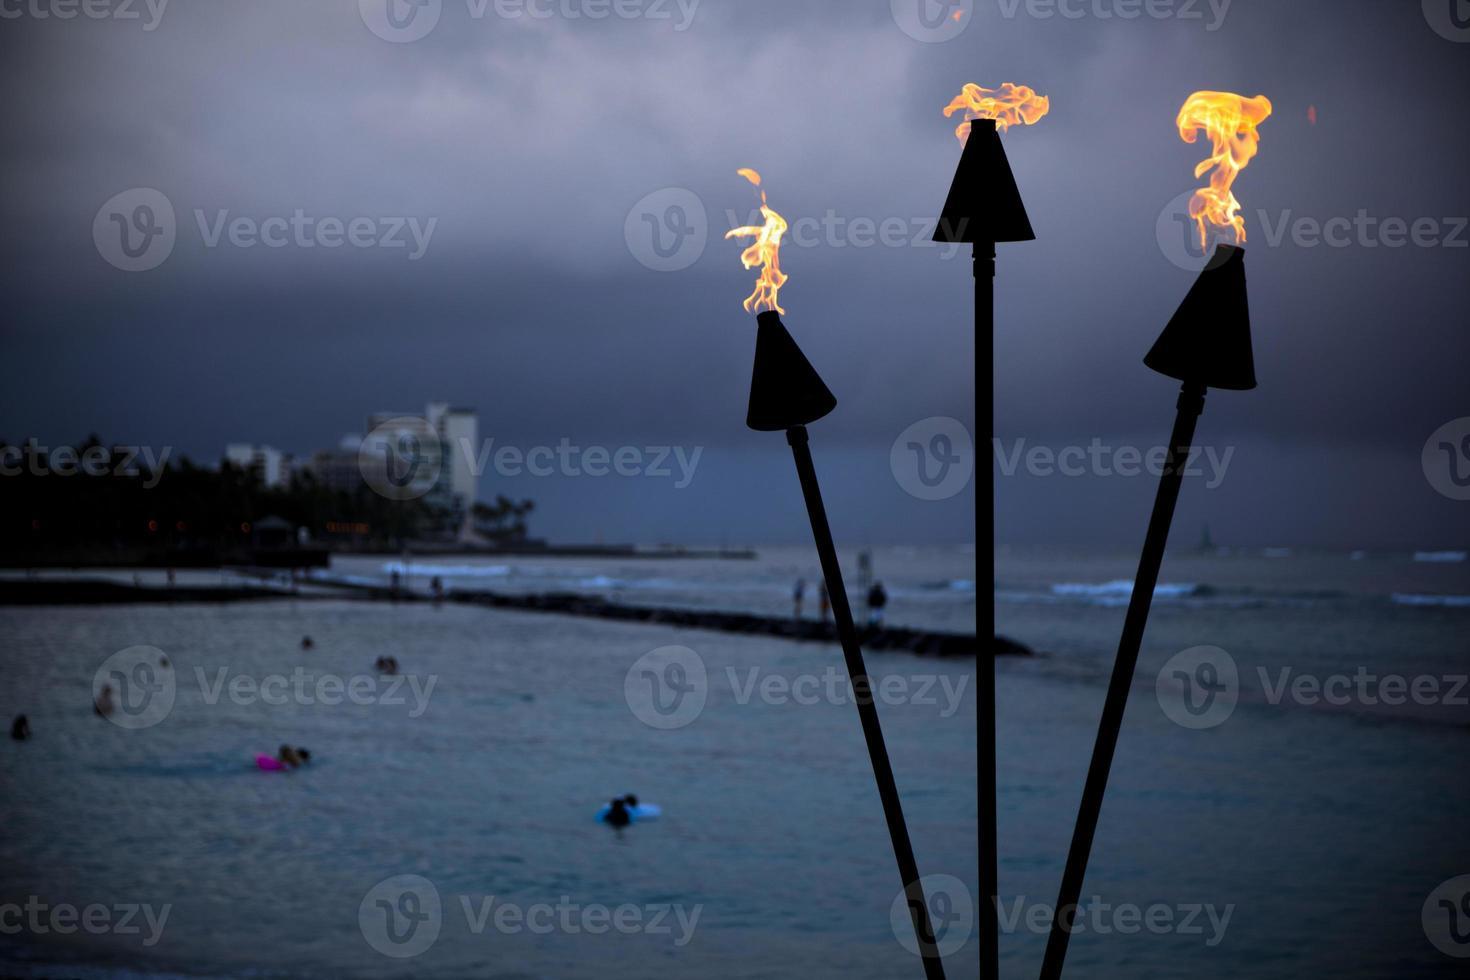 Waikiki brennende Fackel foto